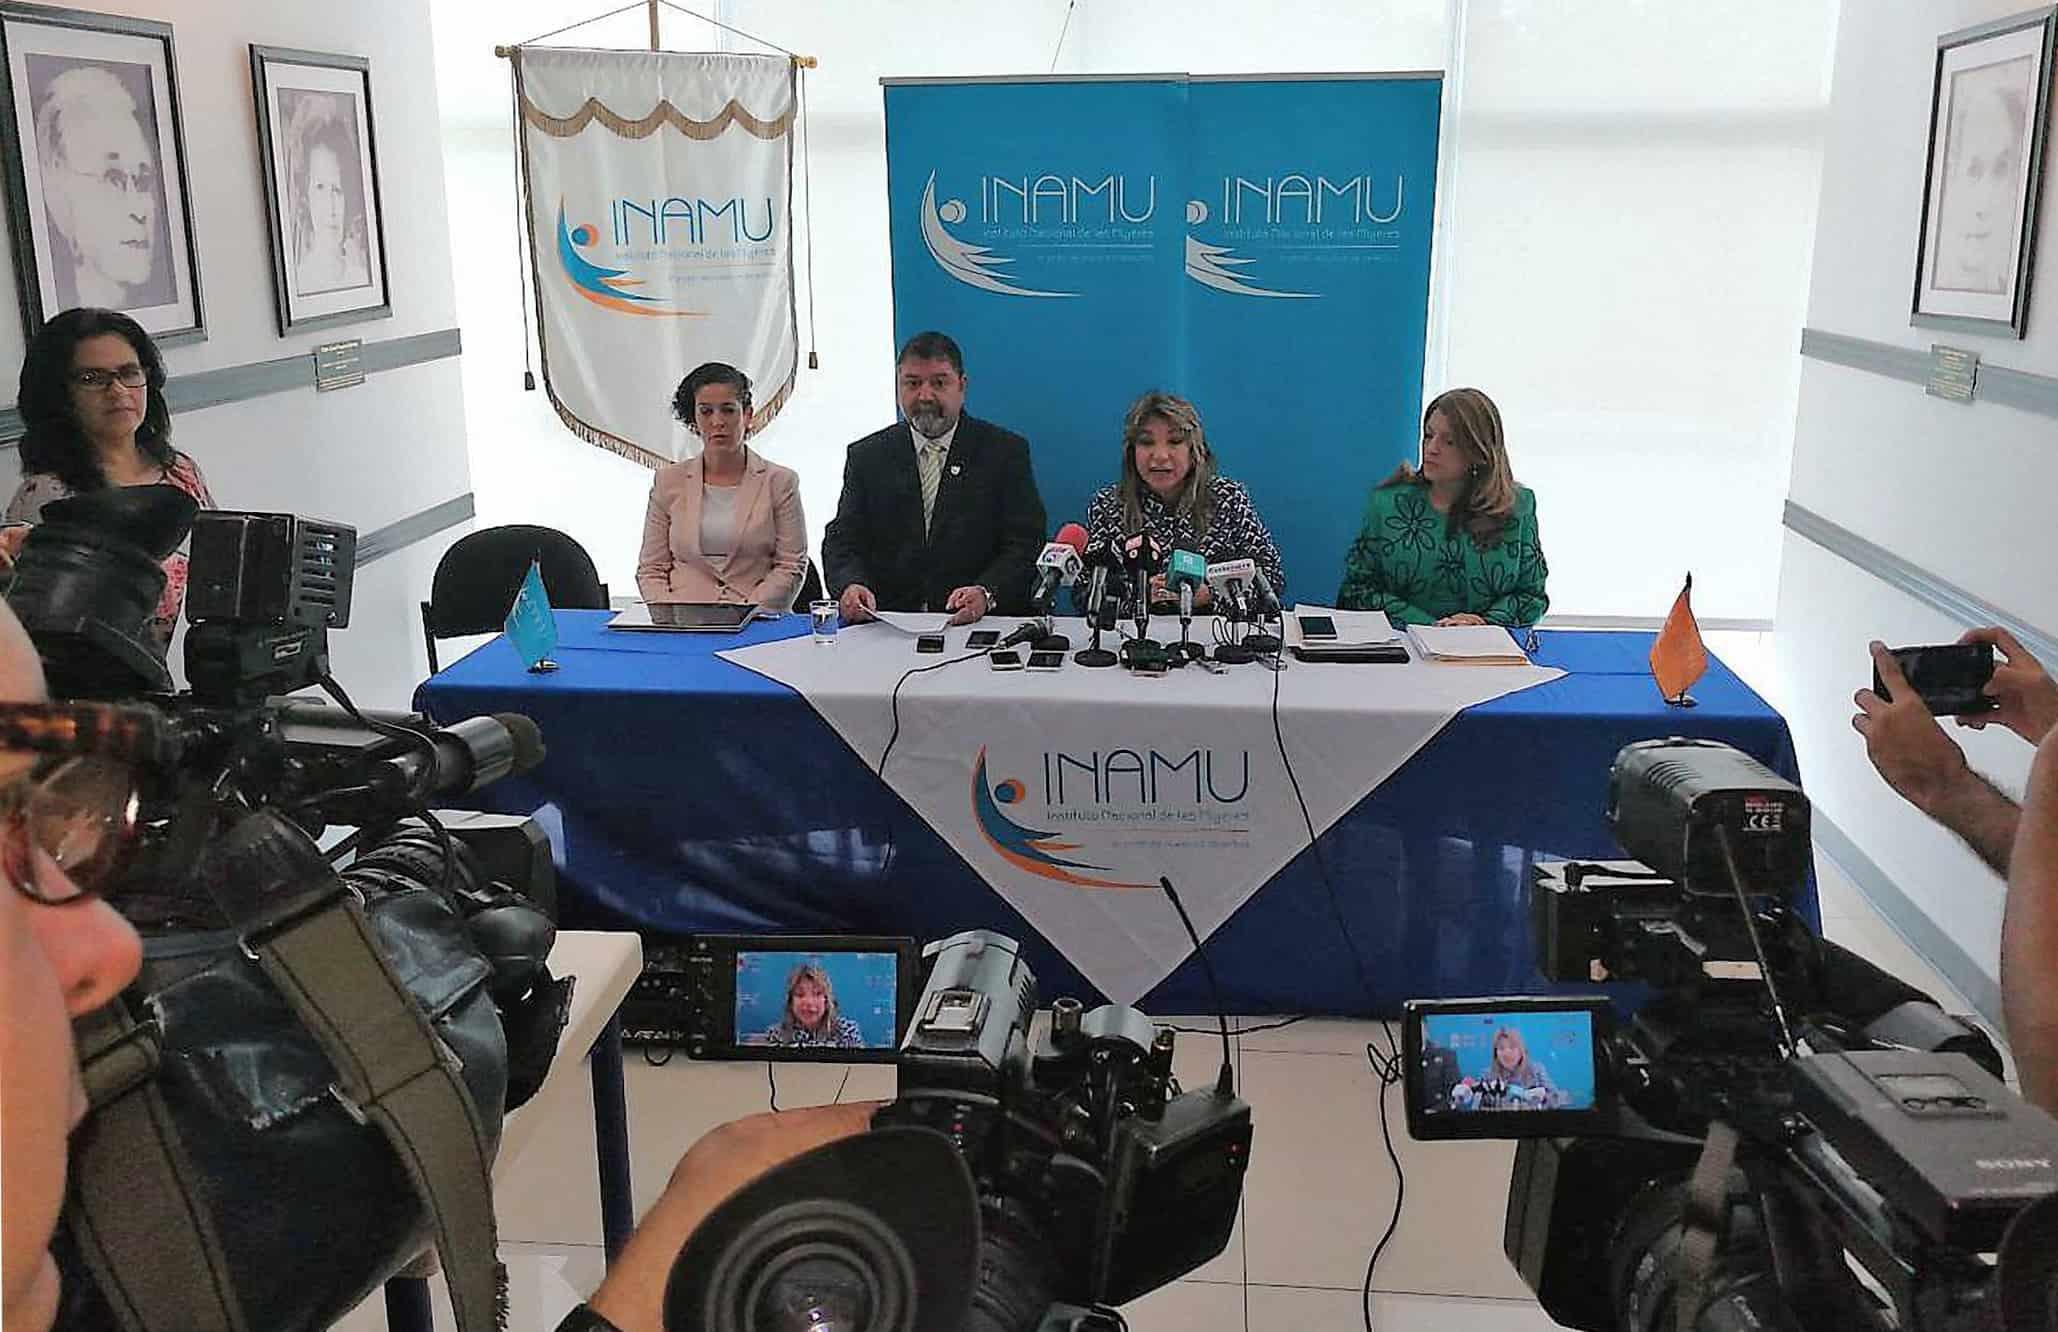 INAMU executive president Alejandra Mora. June 26, 2017.